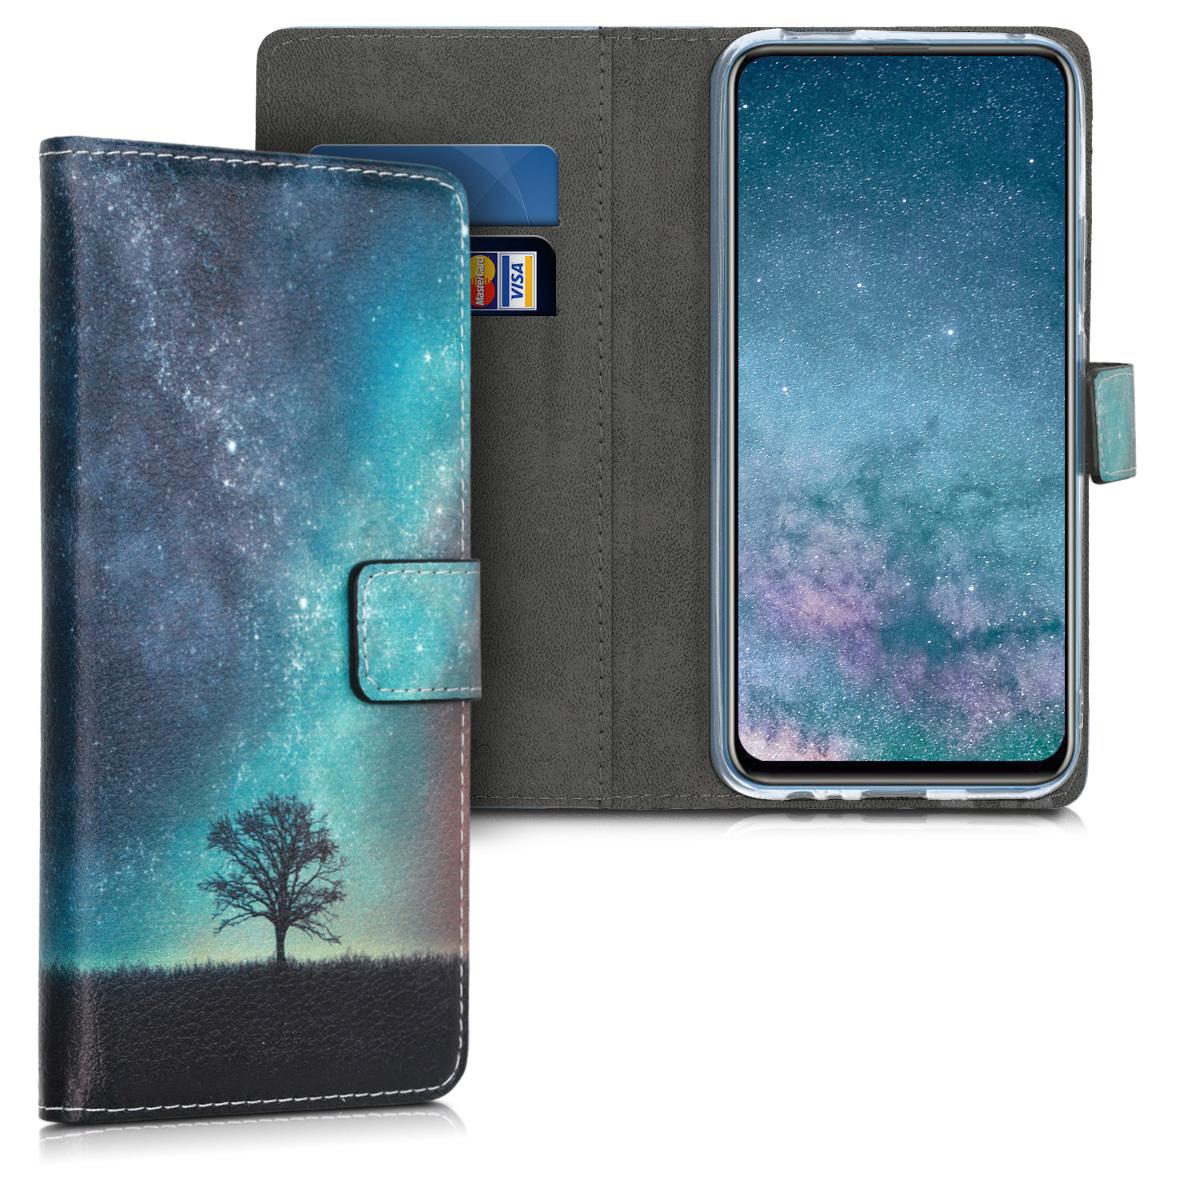 KW Θήκη Πορτοφόλι Huawei P Smart Z - Blue / Grey / Black (49453.03)